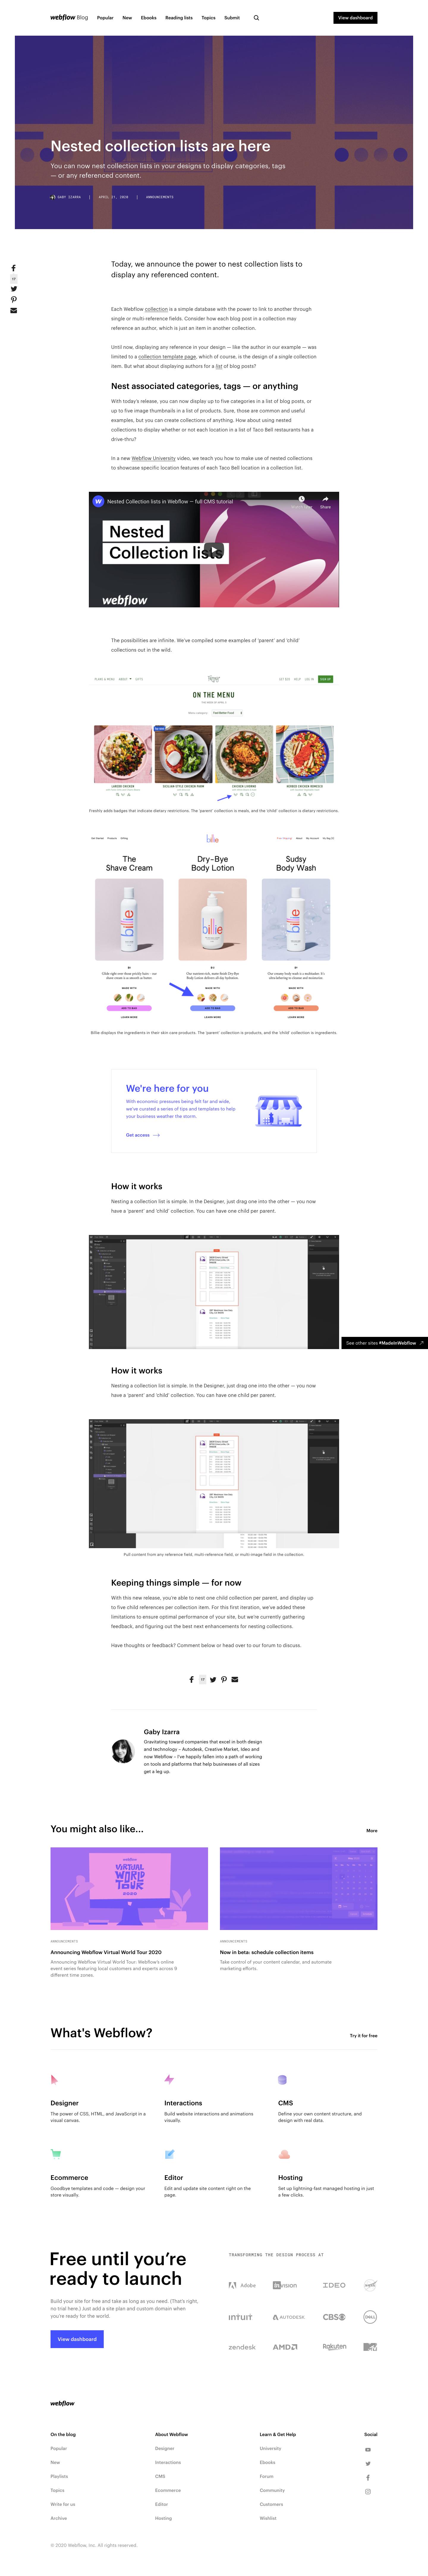 Webflow Product Update